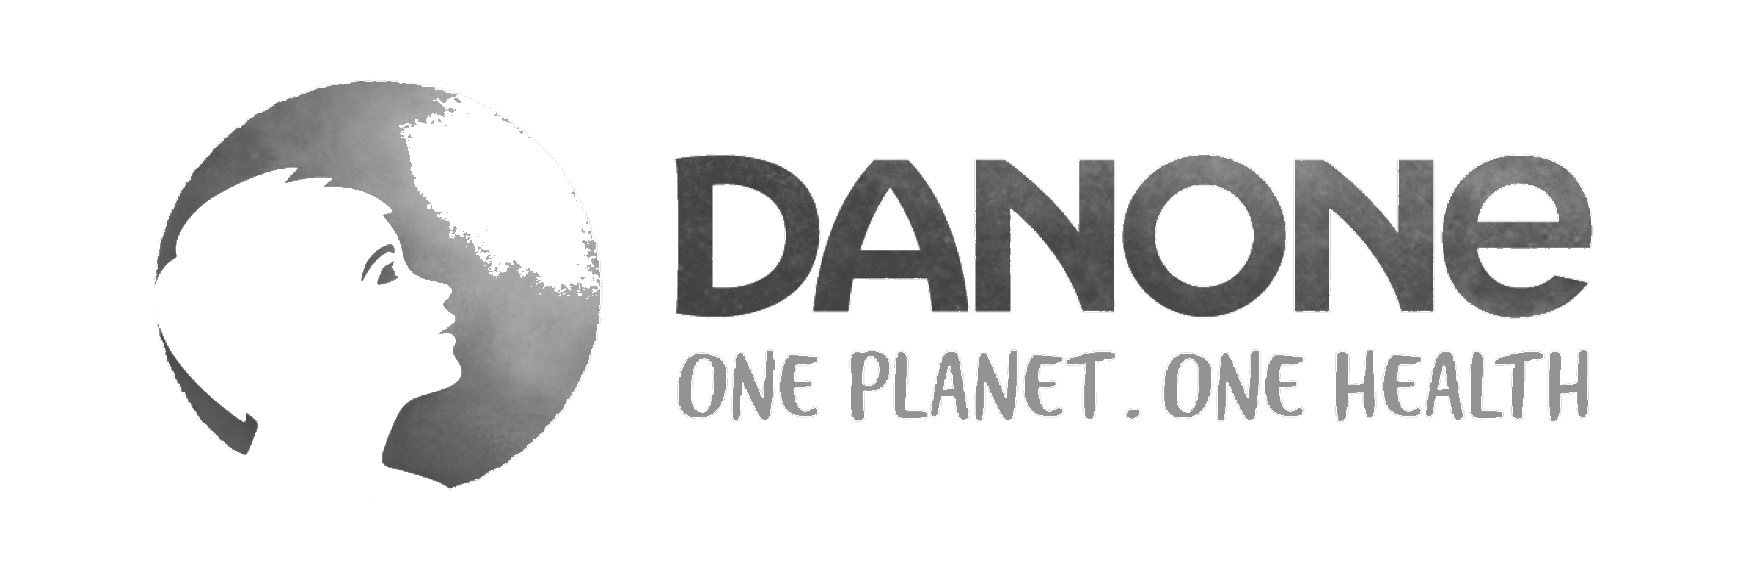 9DANONE-logo - transparent.png